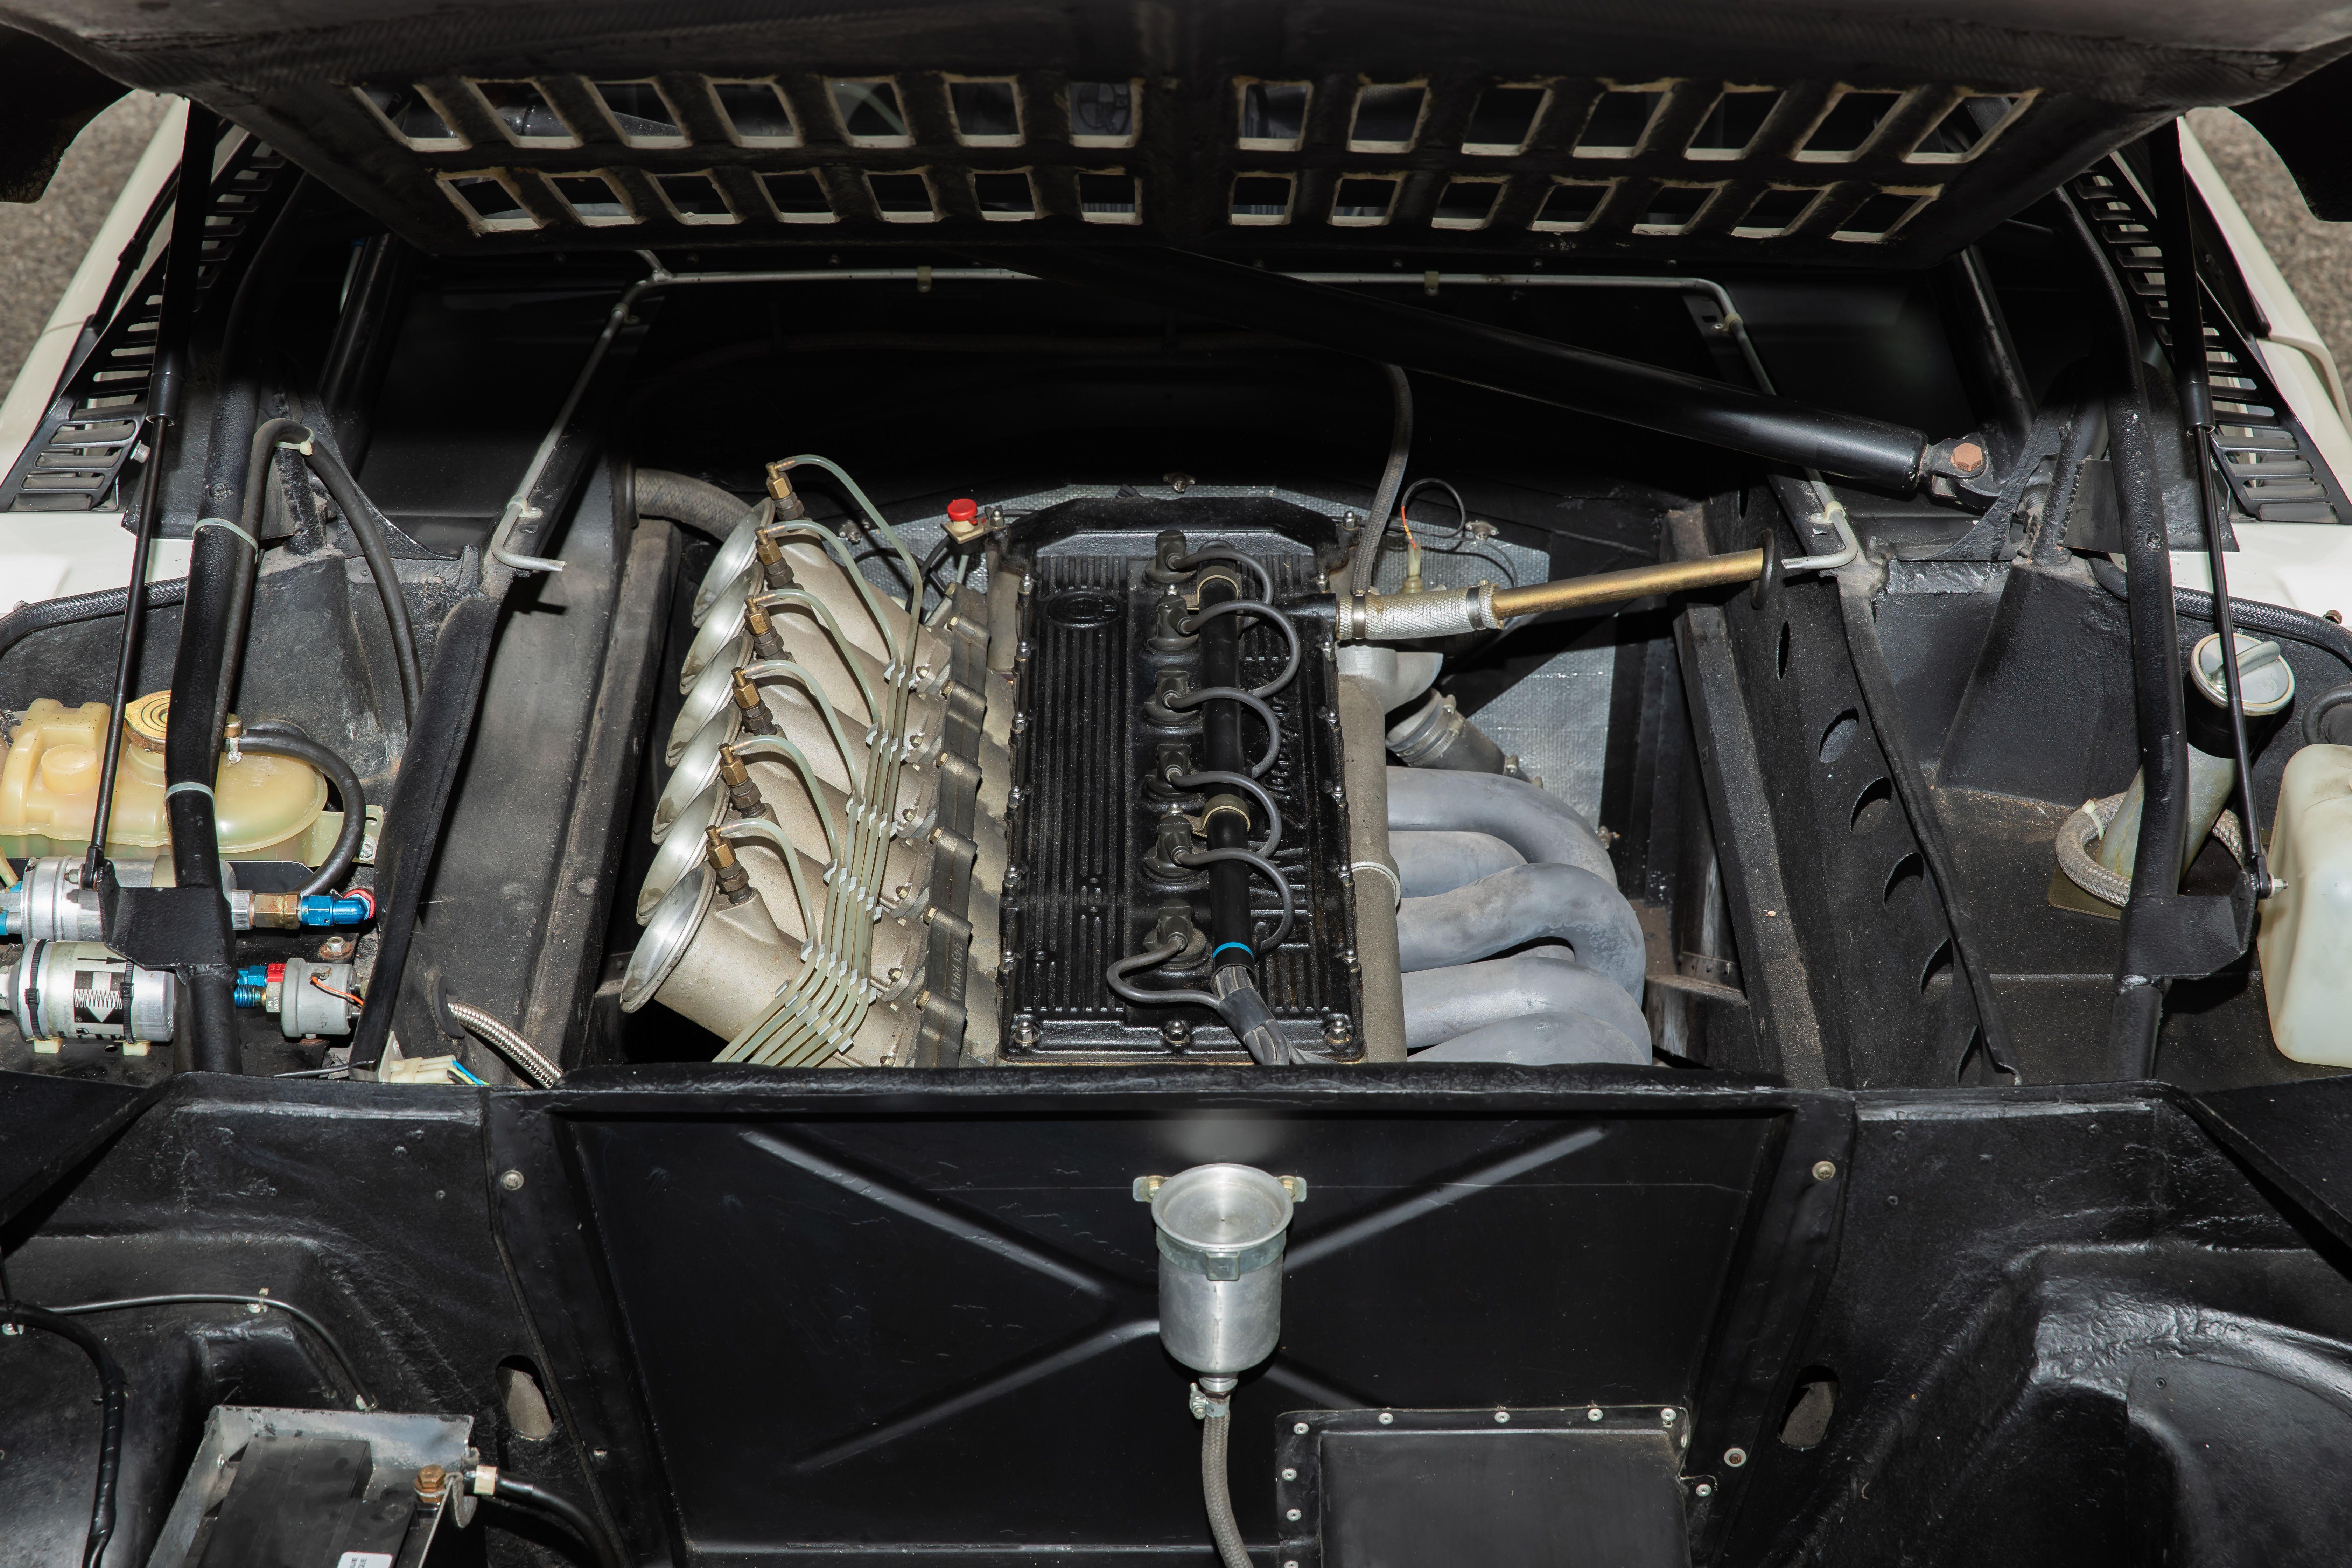 Very Rare Bmw M1 Procar Never Raced Never Used Engine M88 Bmw M1